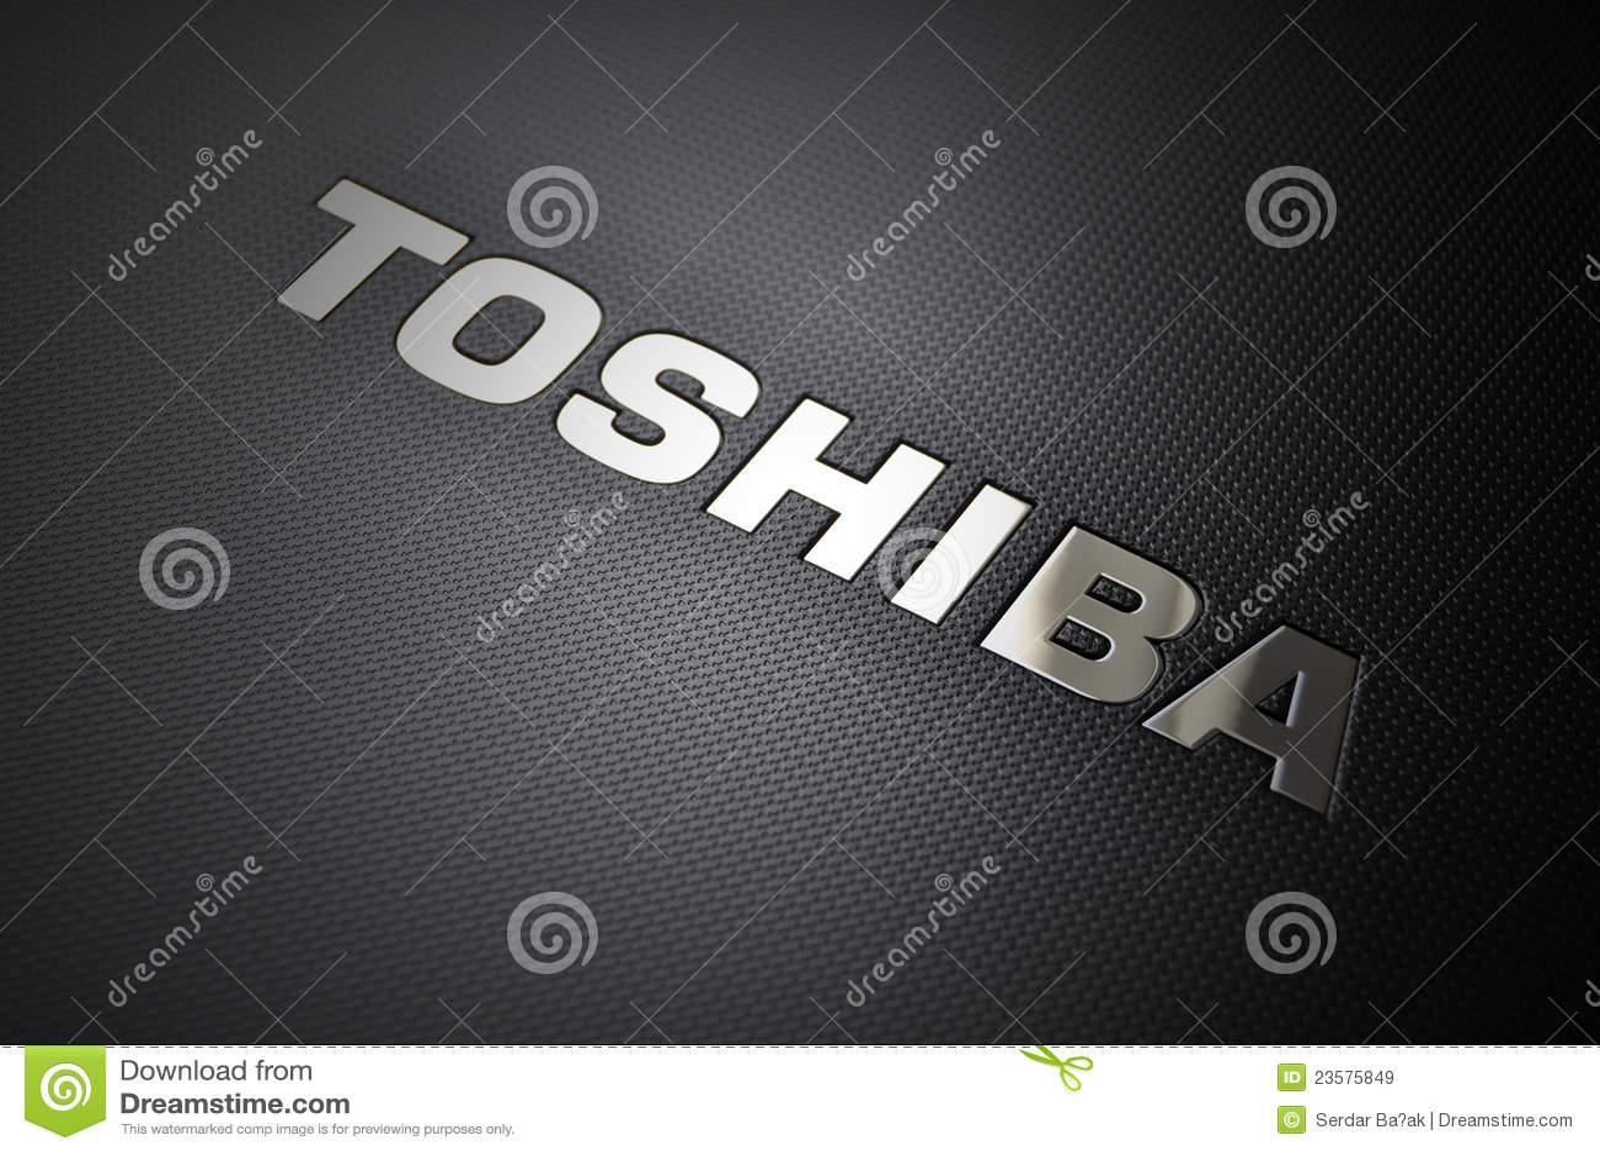 Toshiba Logo Vector free